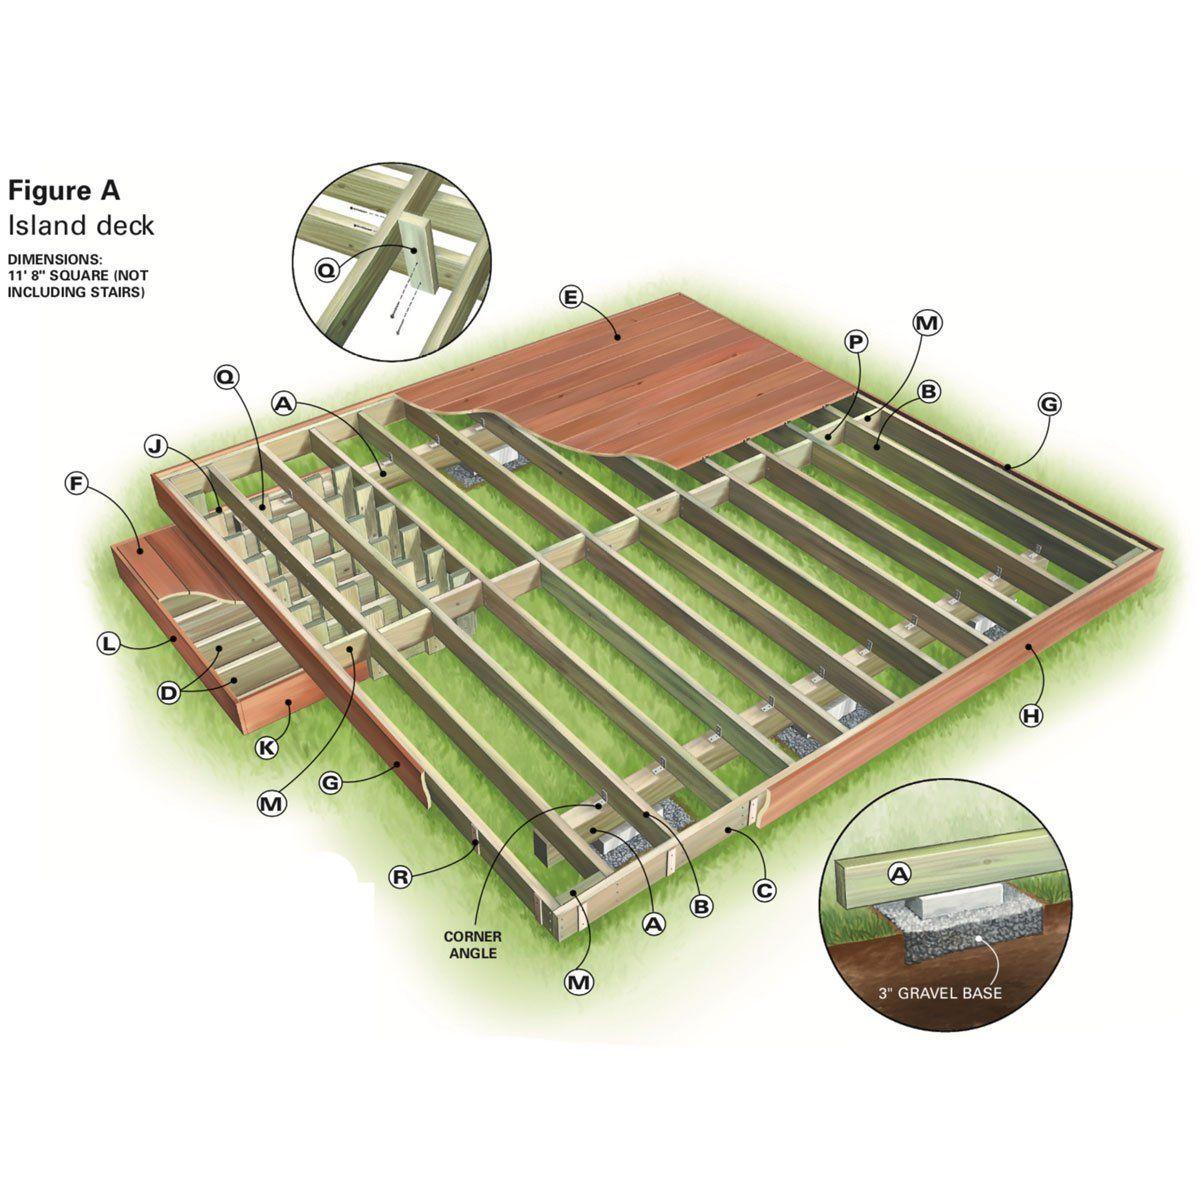 Backyard Decks Build an Island Deck How to level ground